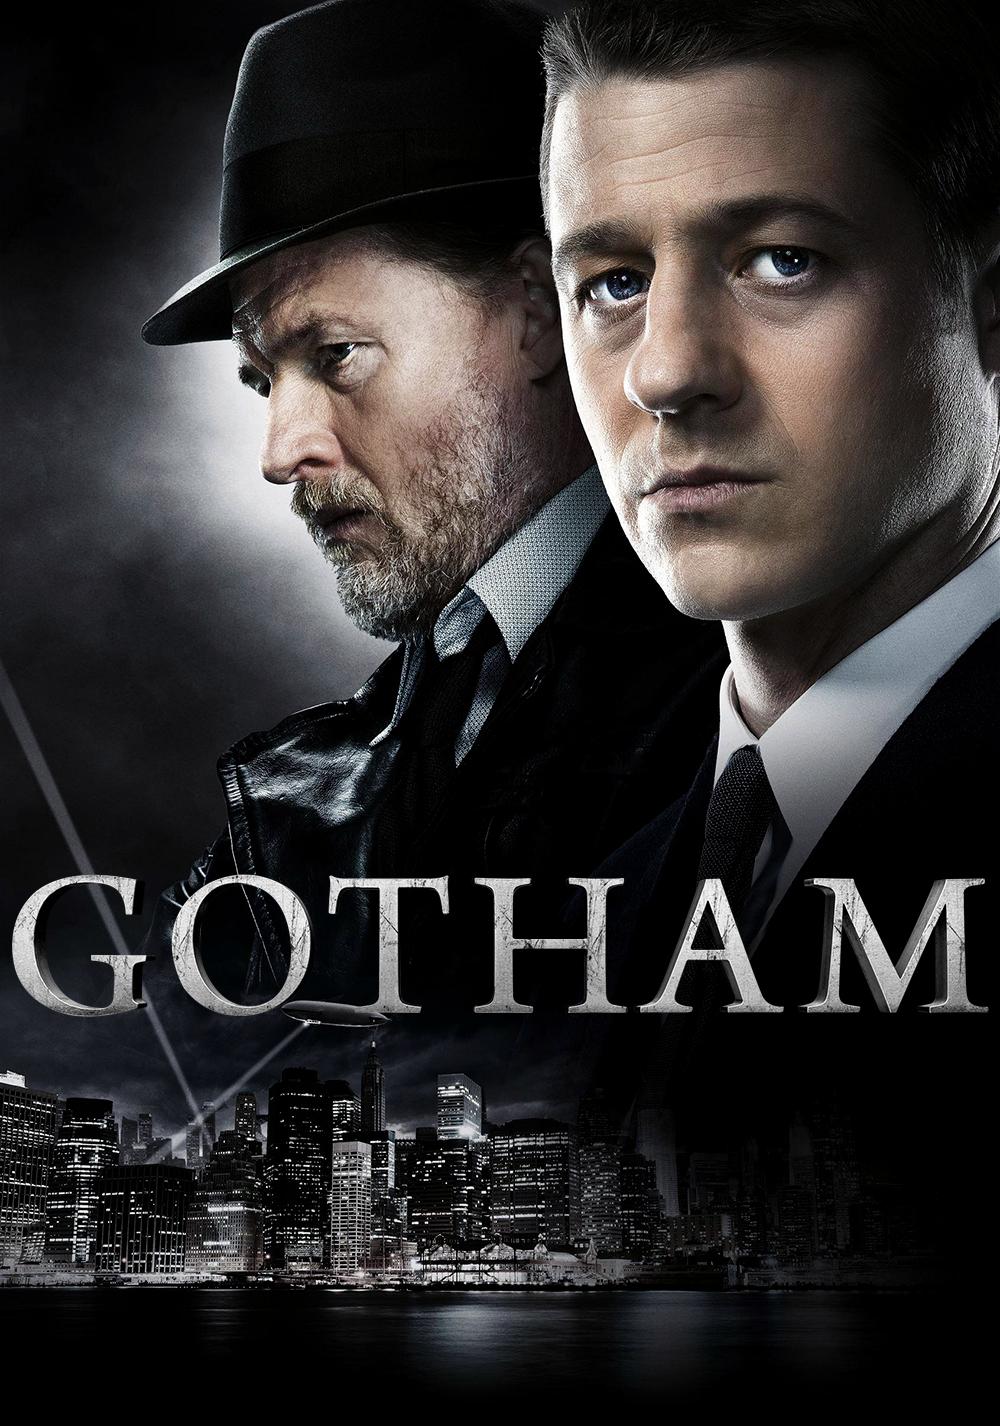 Gotham Series